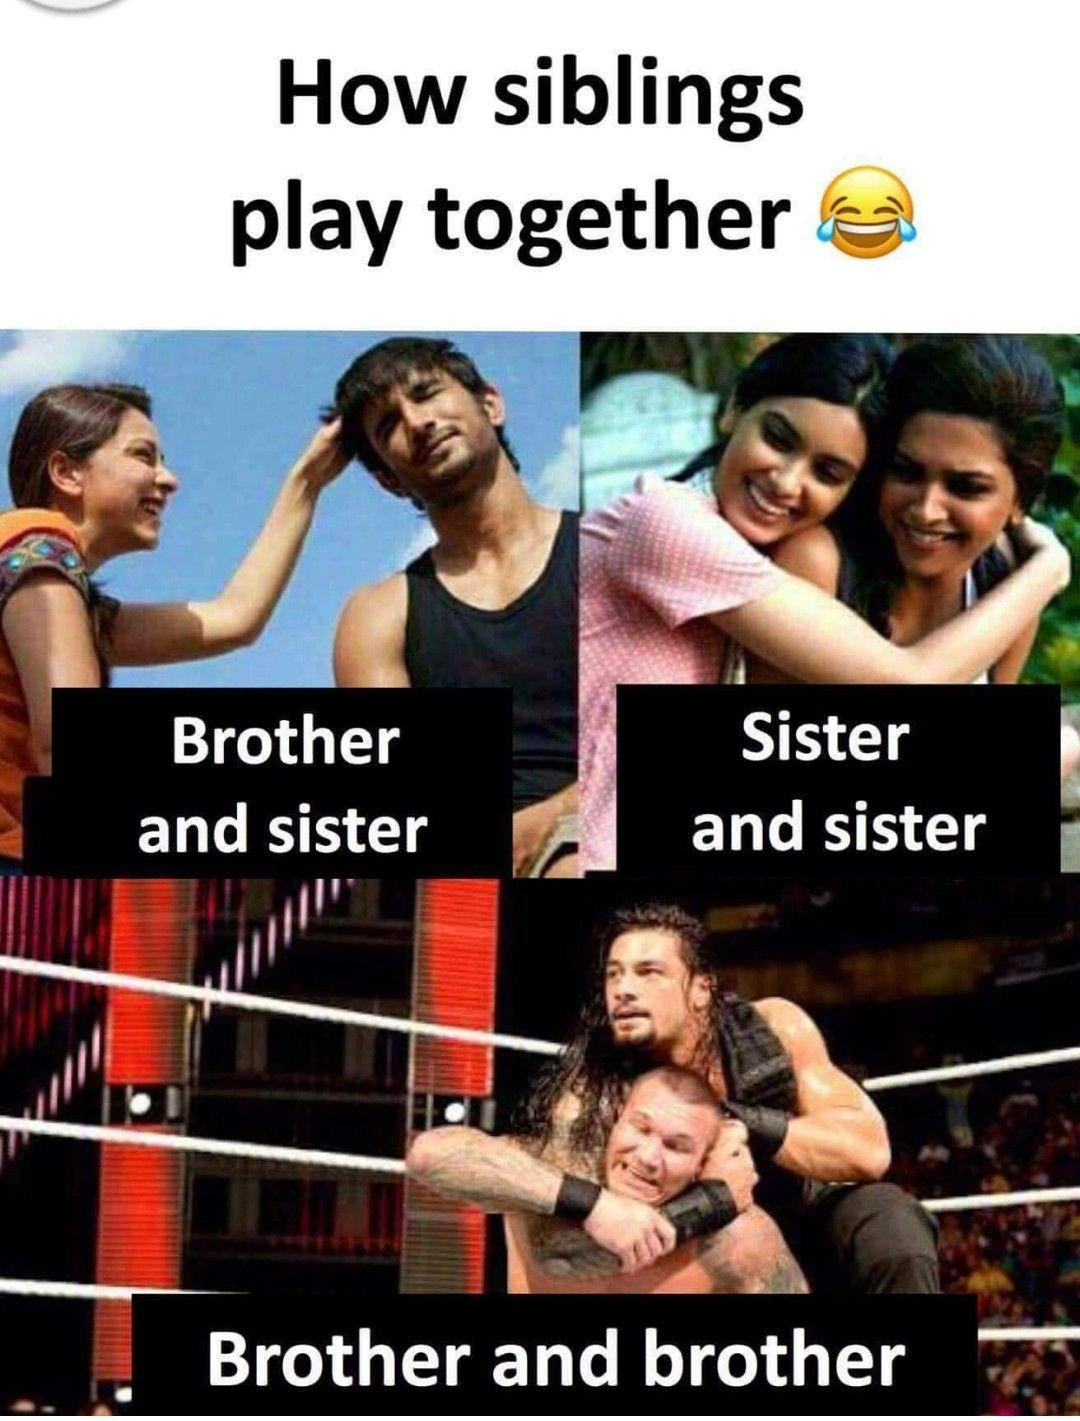 Haha #siblings #brother #sister #fight #meme #haha #play